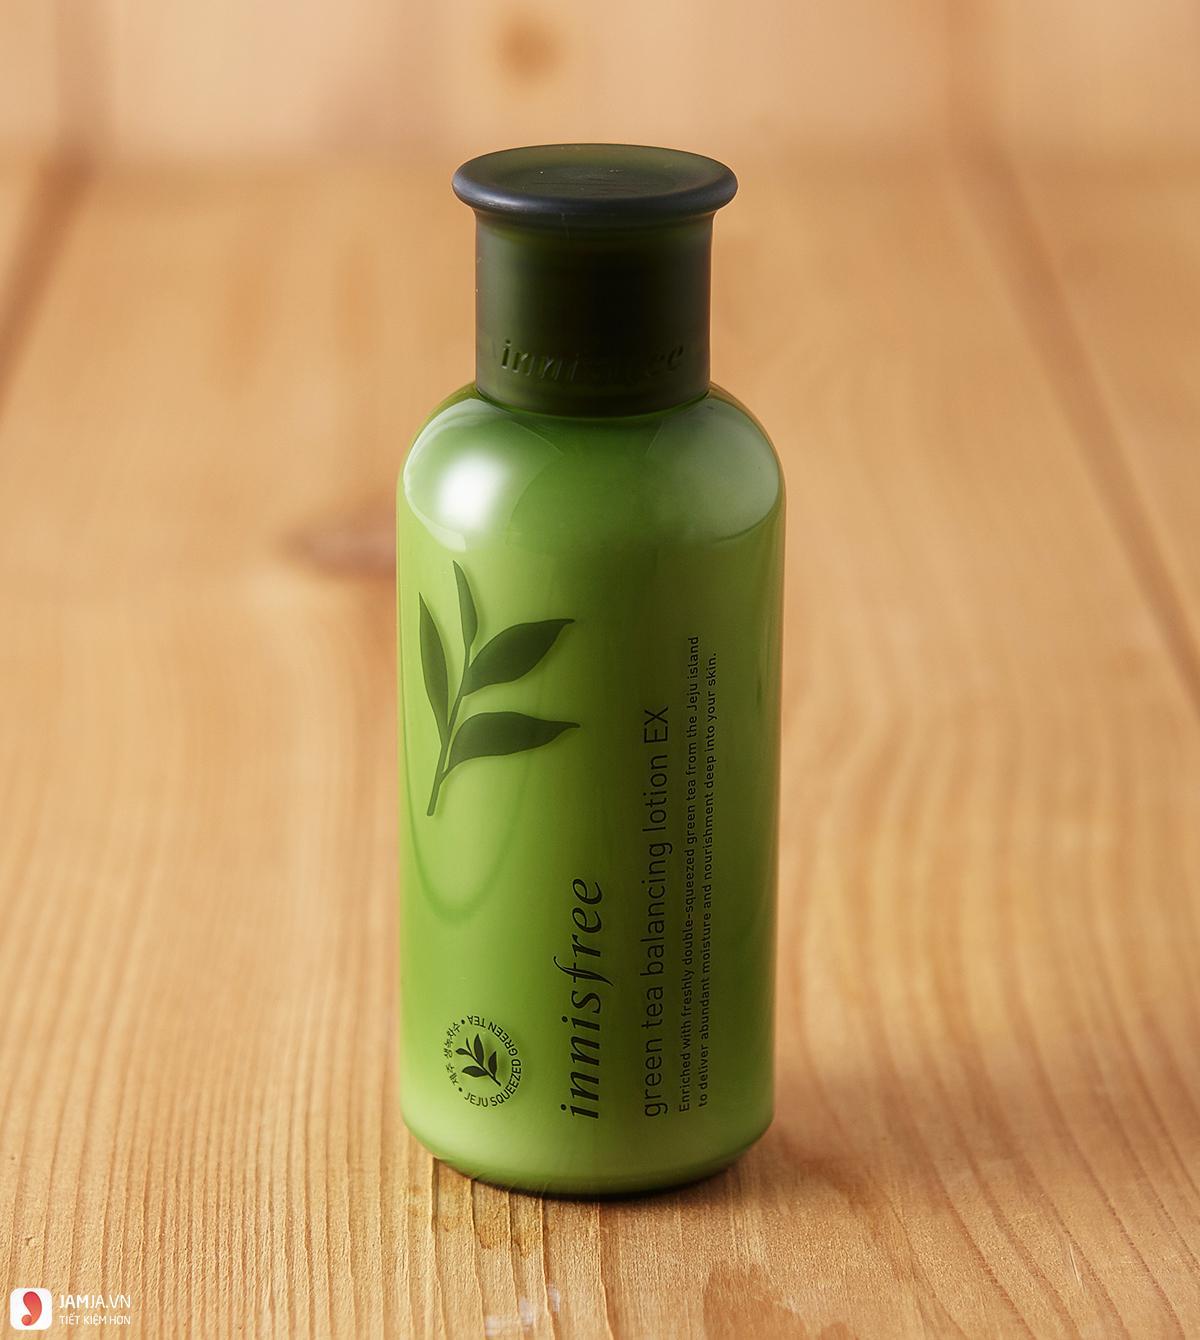 Ưu điểmInnisfree Green Tea Balancing Skin